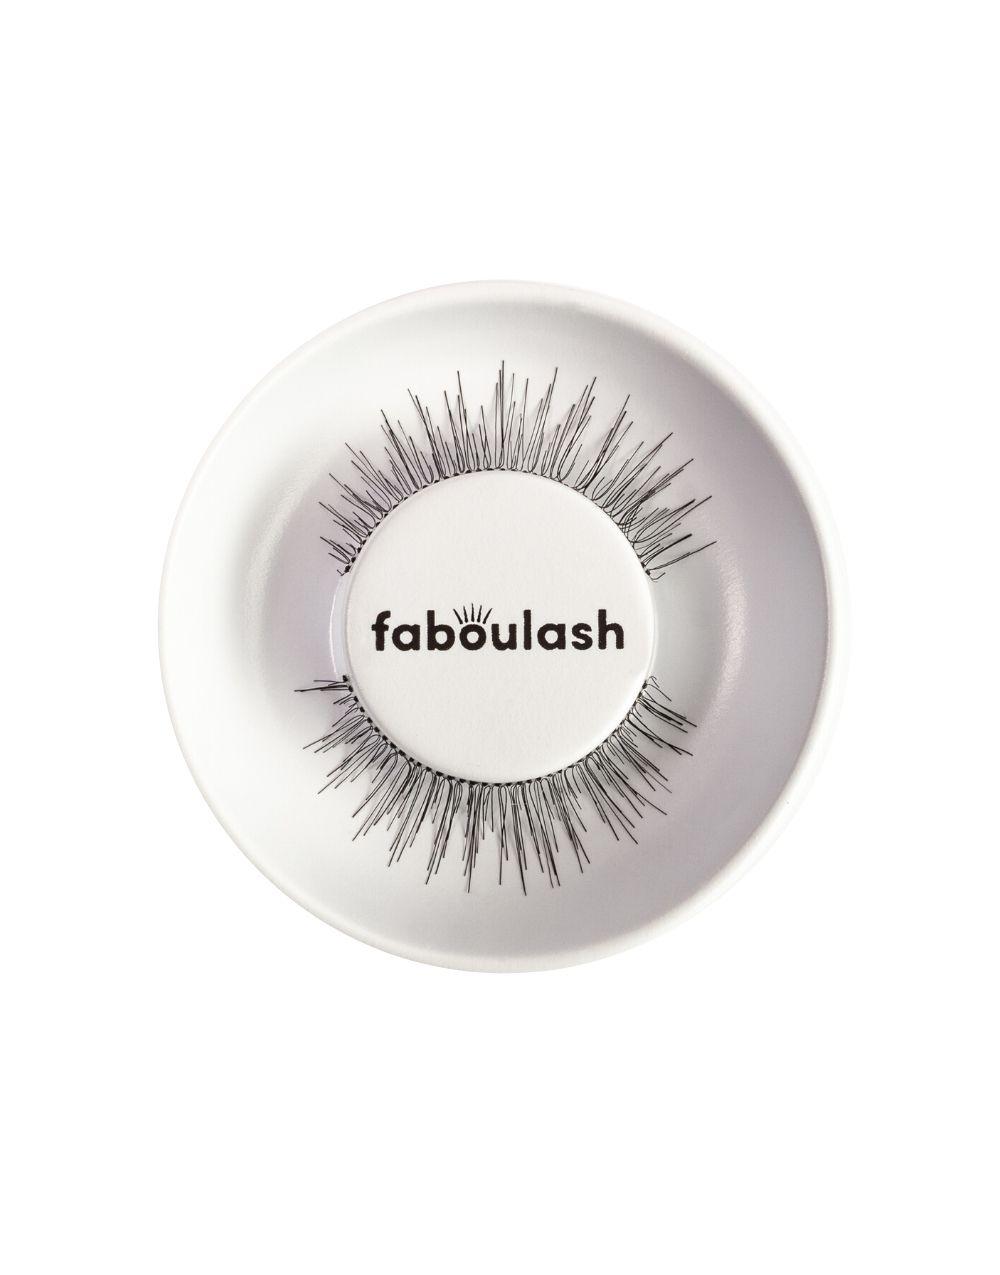 Faboulash 503 by Faboulash